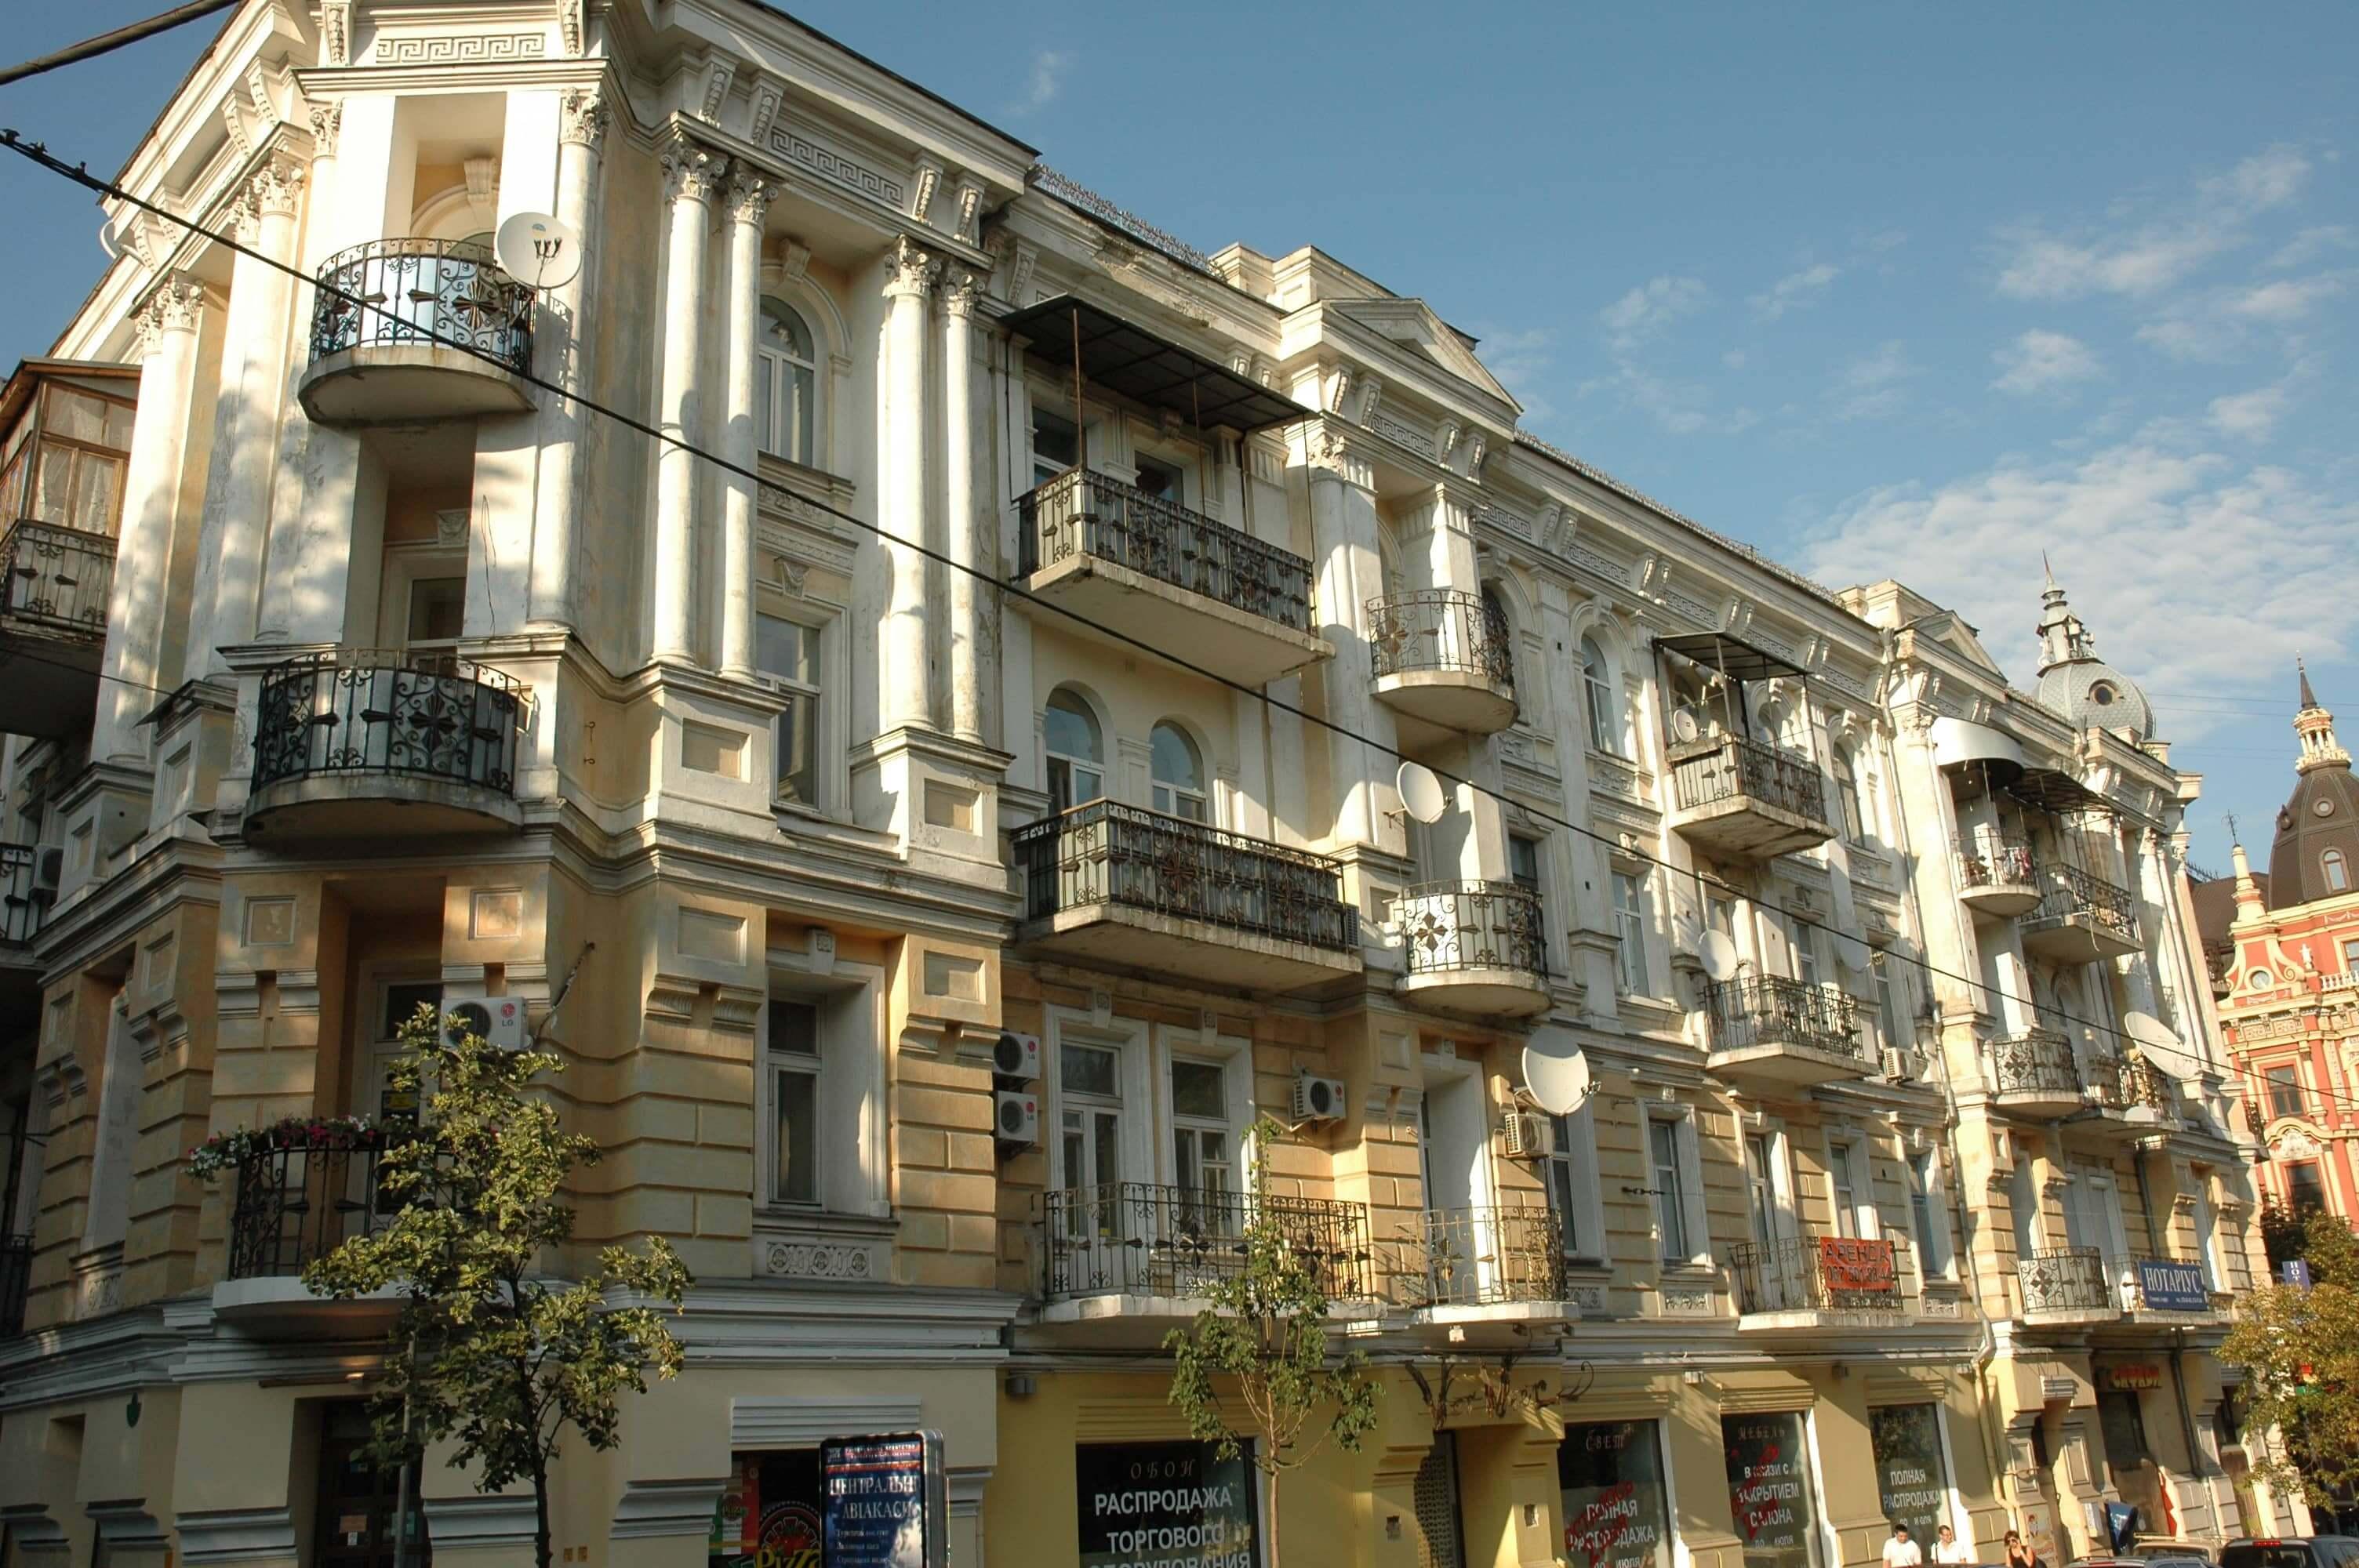 40/2, Volodymyrska Str. – the profitable house of Mikhailov